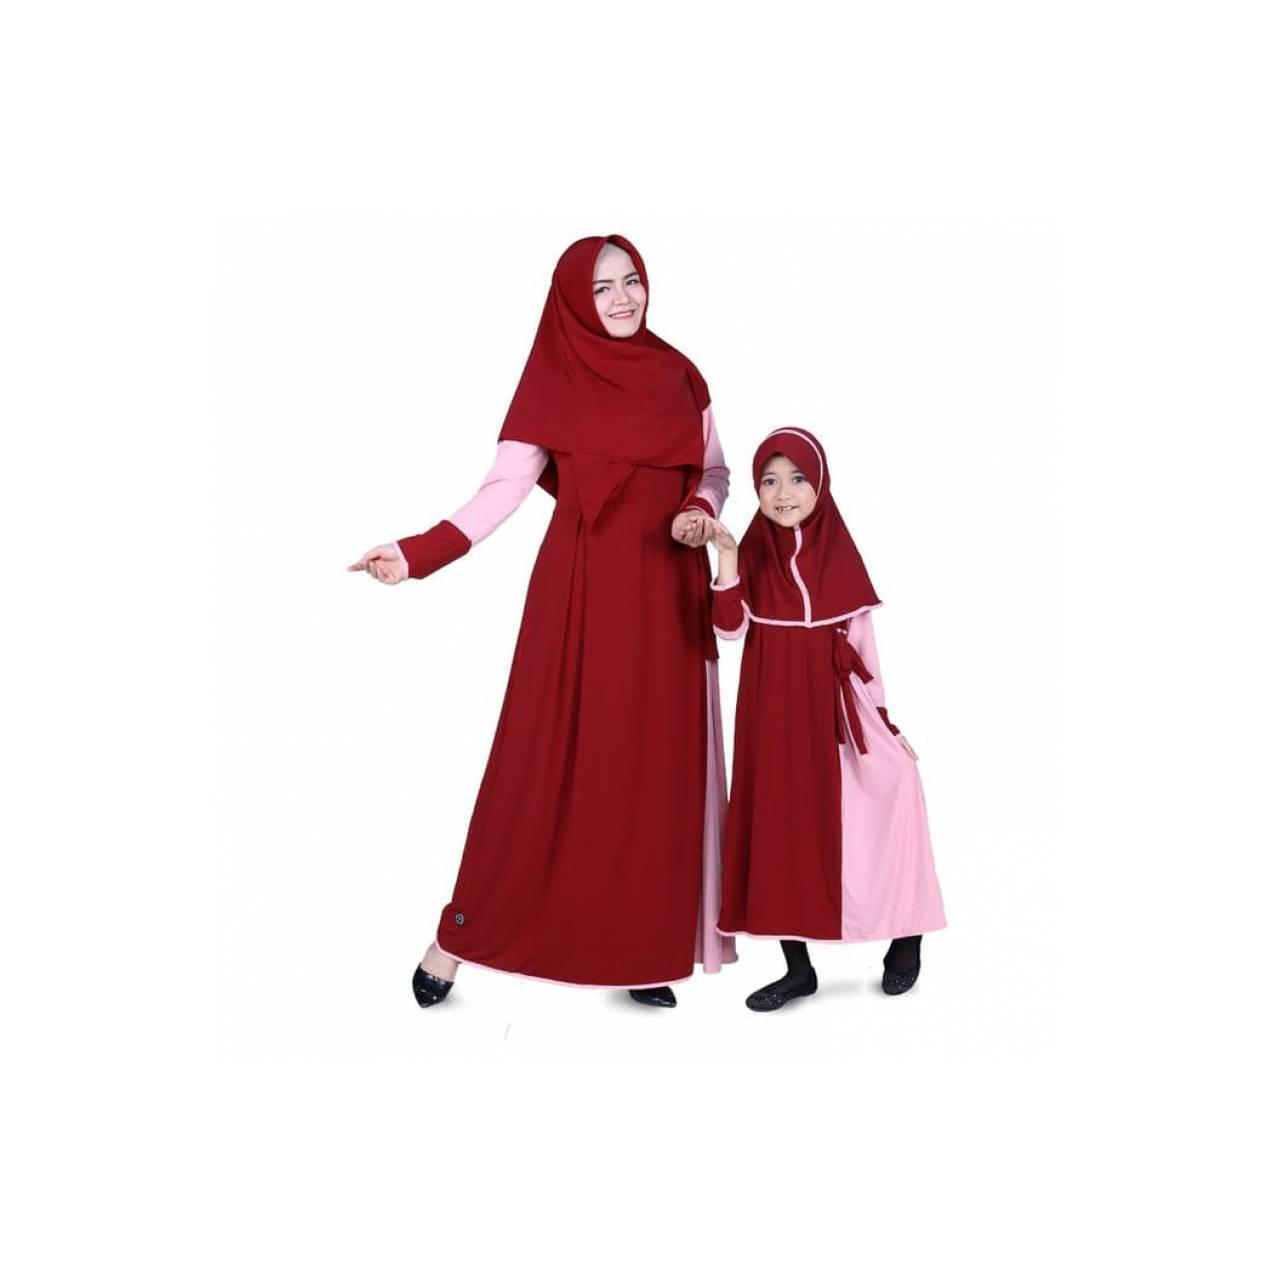 Baju Muslim Couple Gamis Ibu dan Anak Jersey -Marun CMJRN02